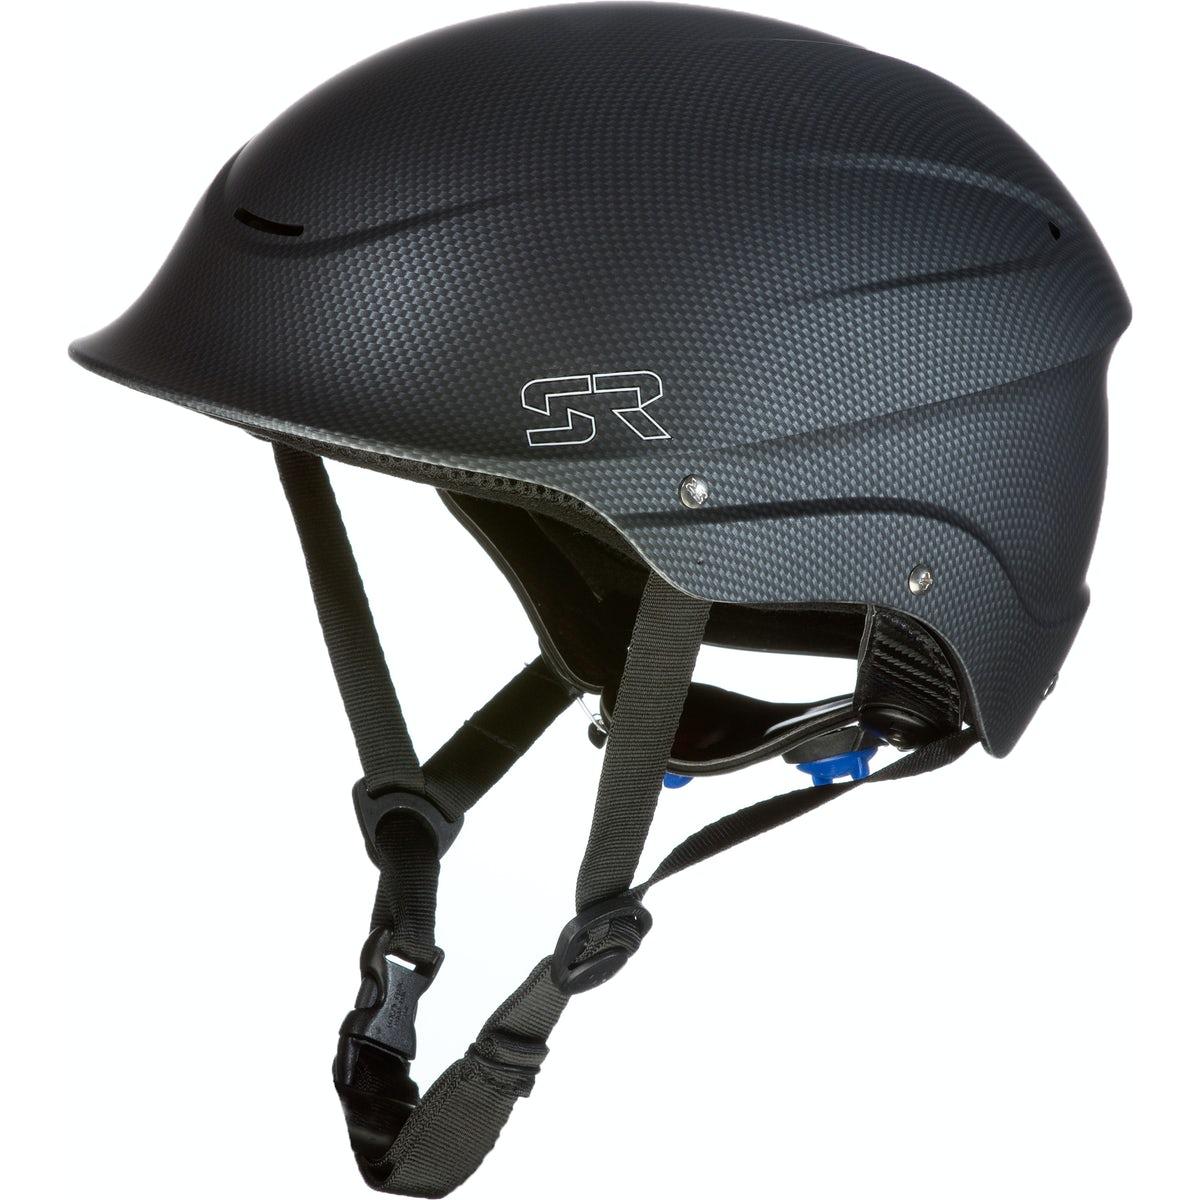 Shred Ready Paddling Helmet